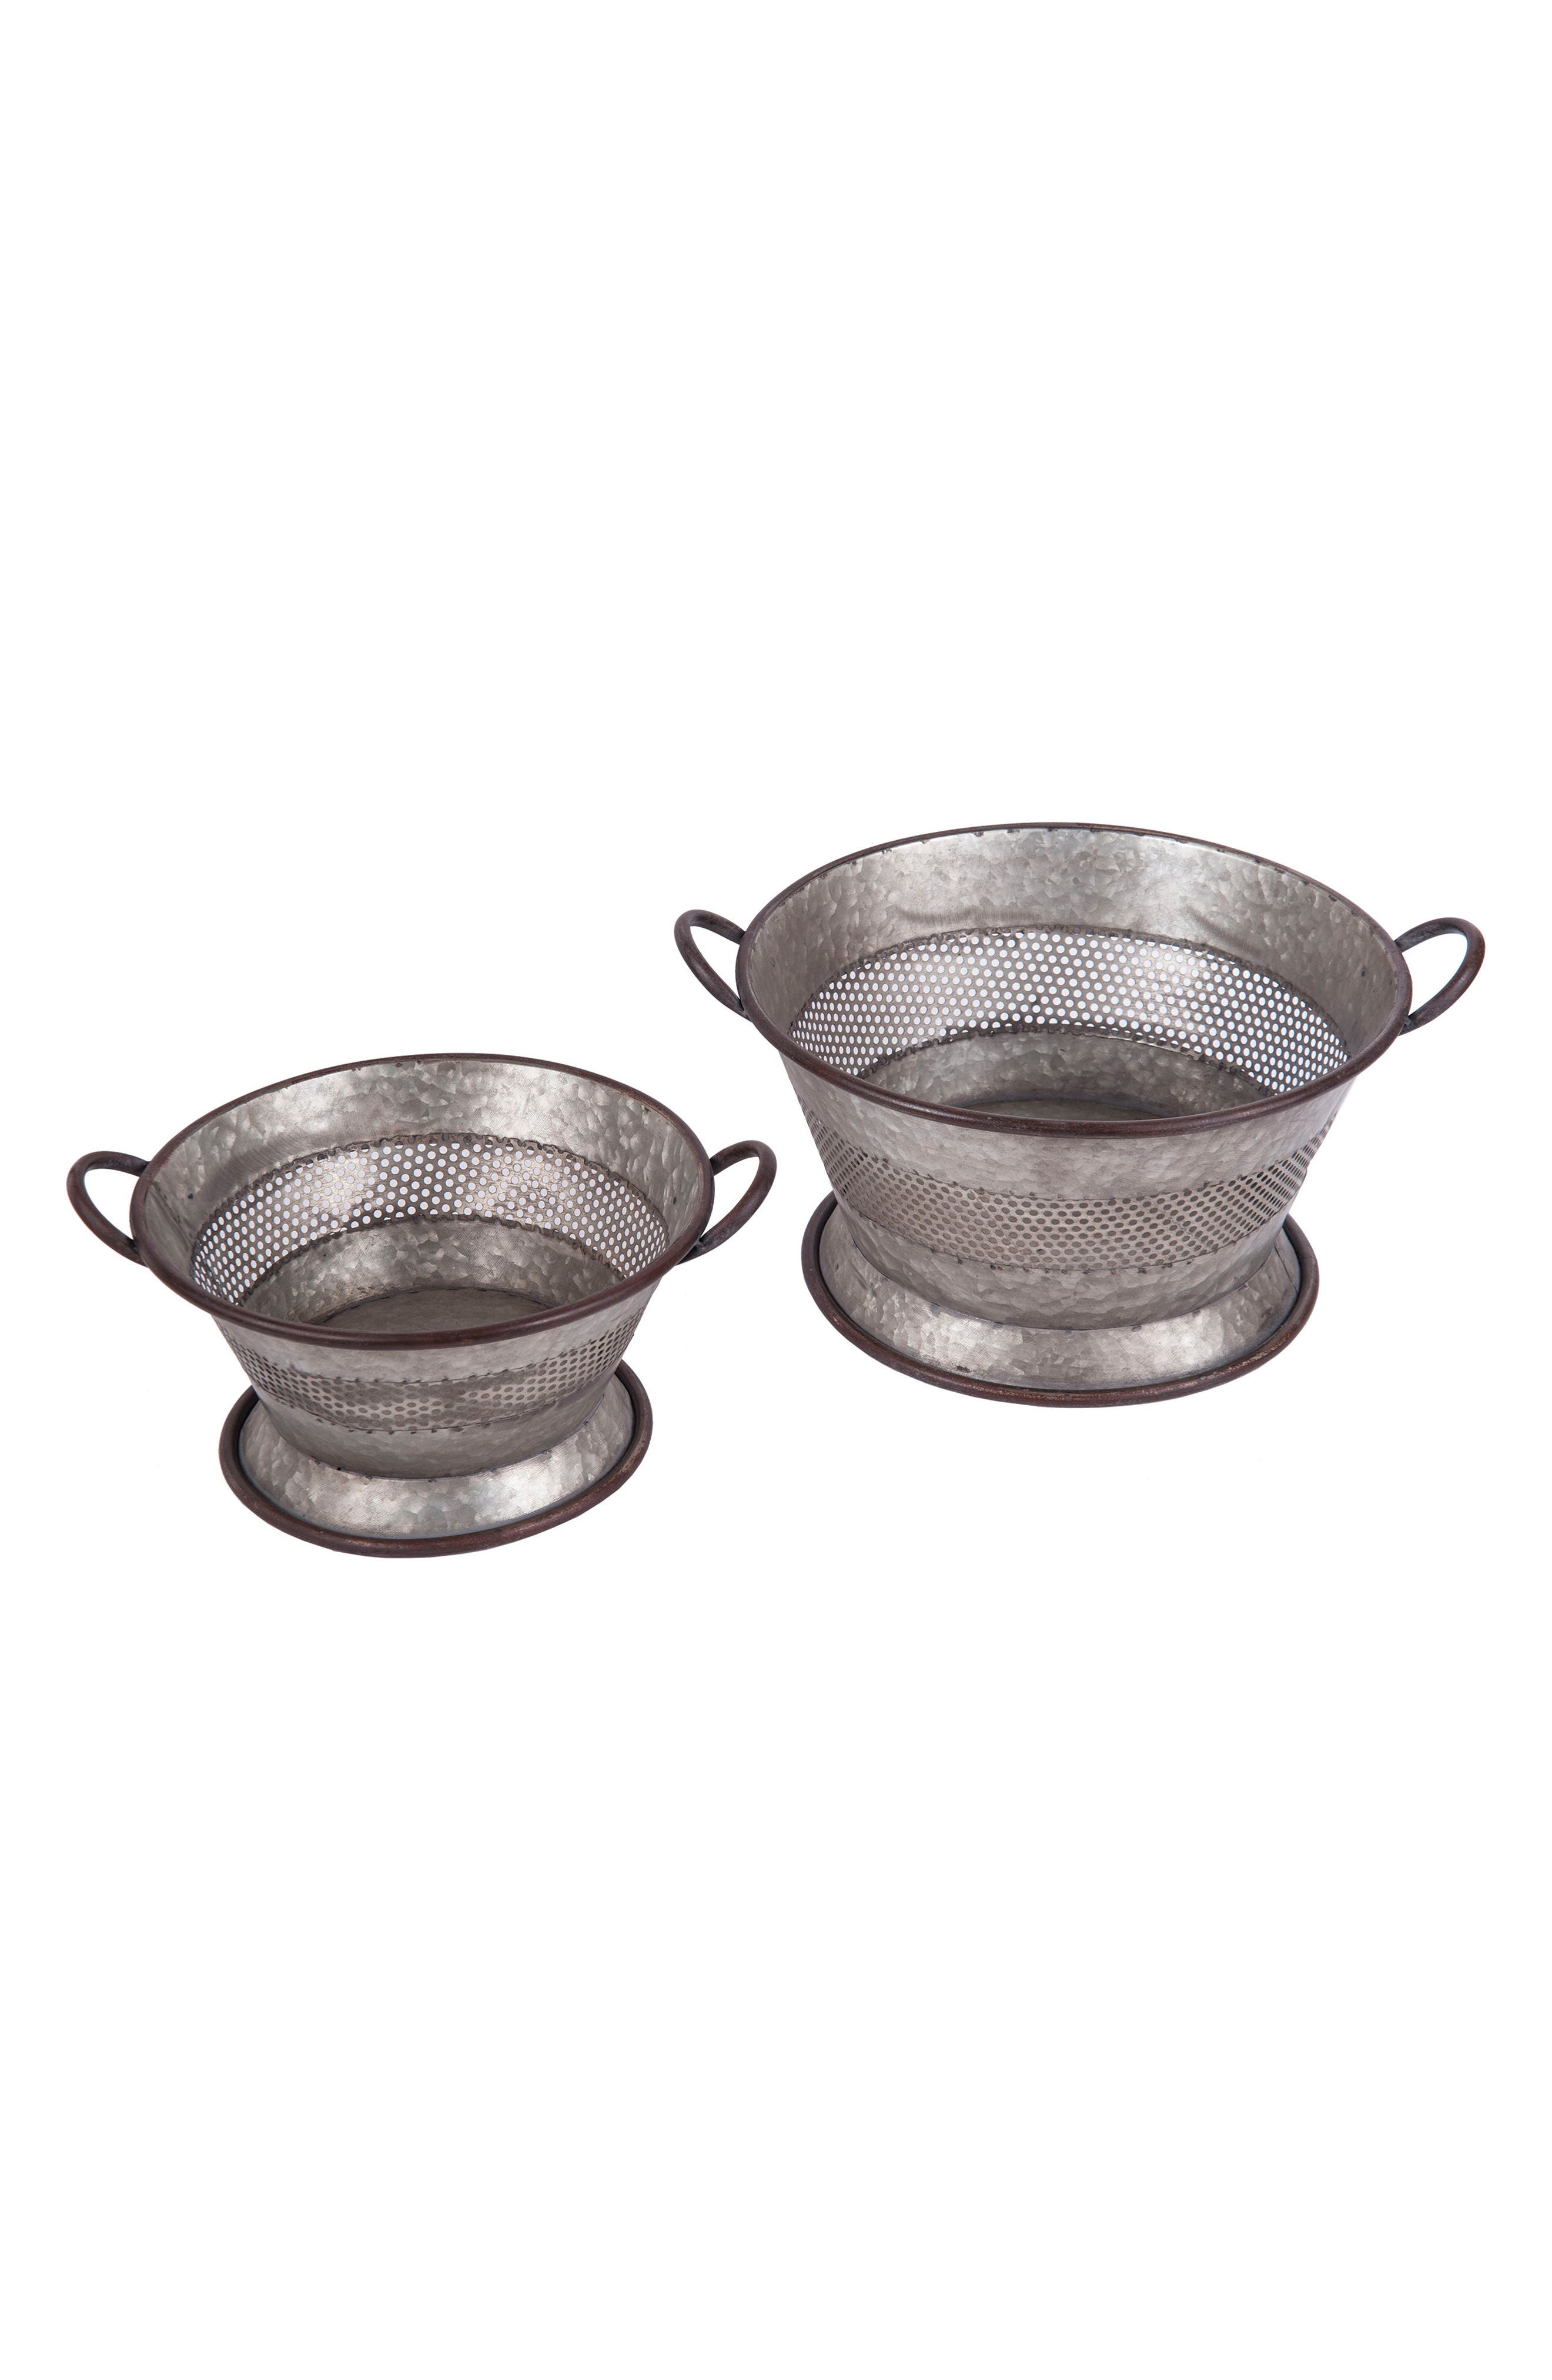 Set of 2 Decorative Strainer Baskets,                             Main thumbnail 1, color,                             Metal